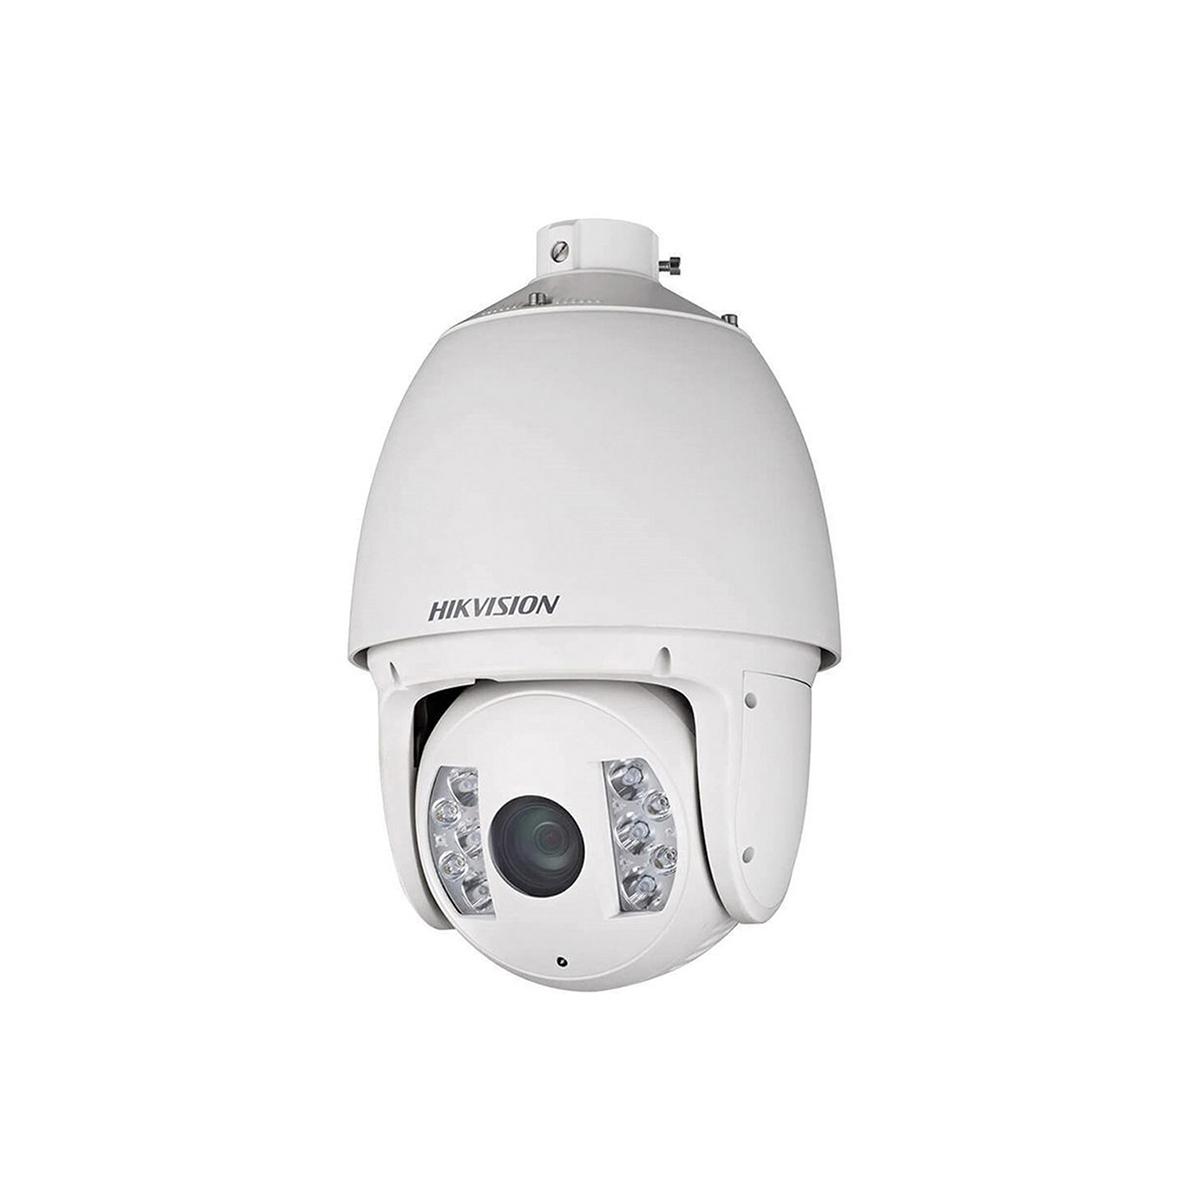 Cámara Hikvision IP PTZ DS-2DE7430IW-AE 4MP